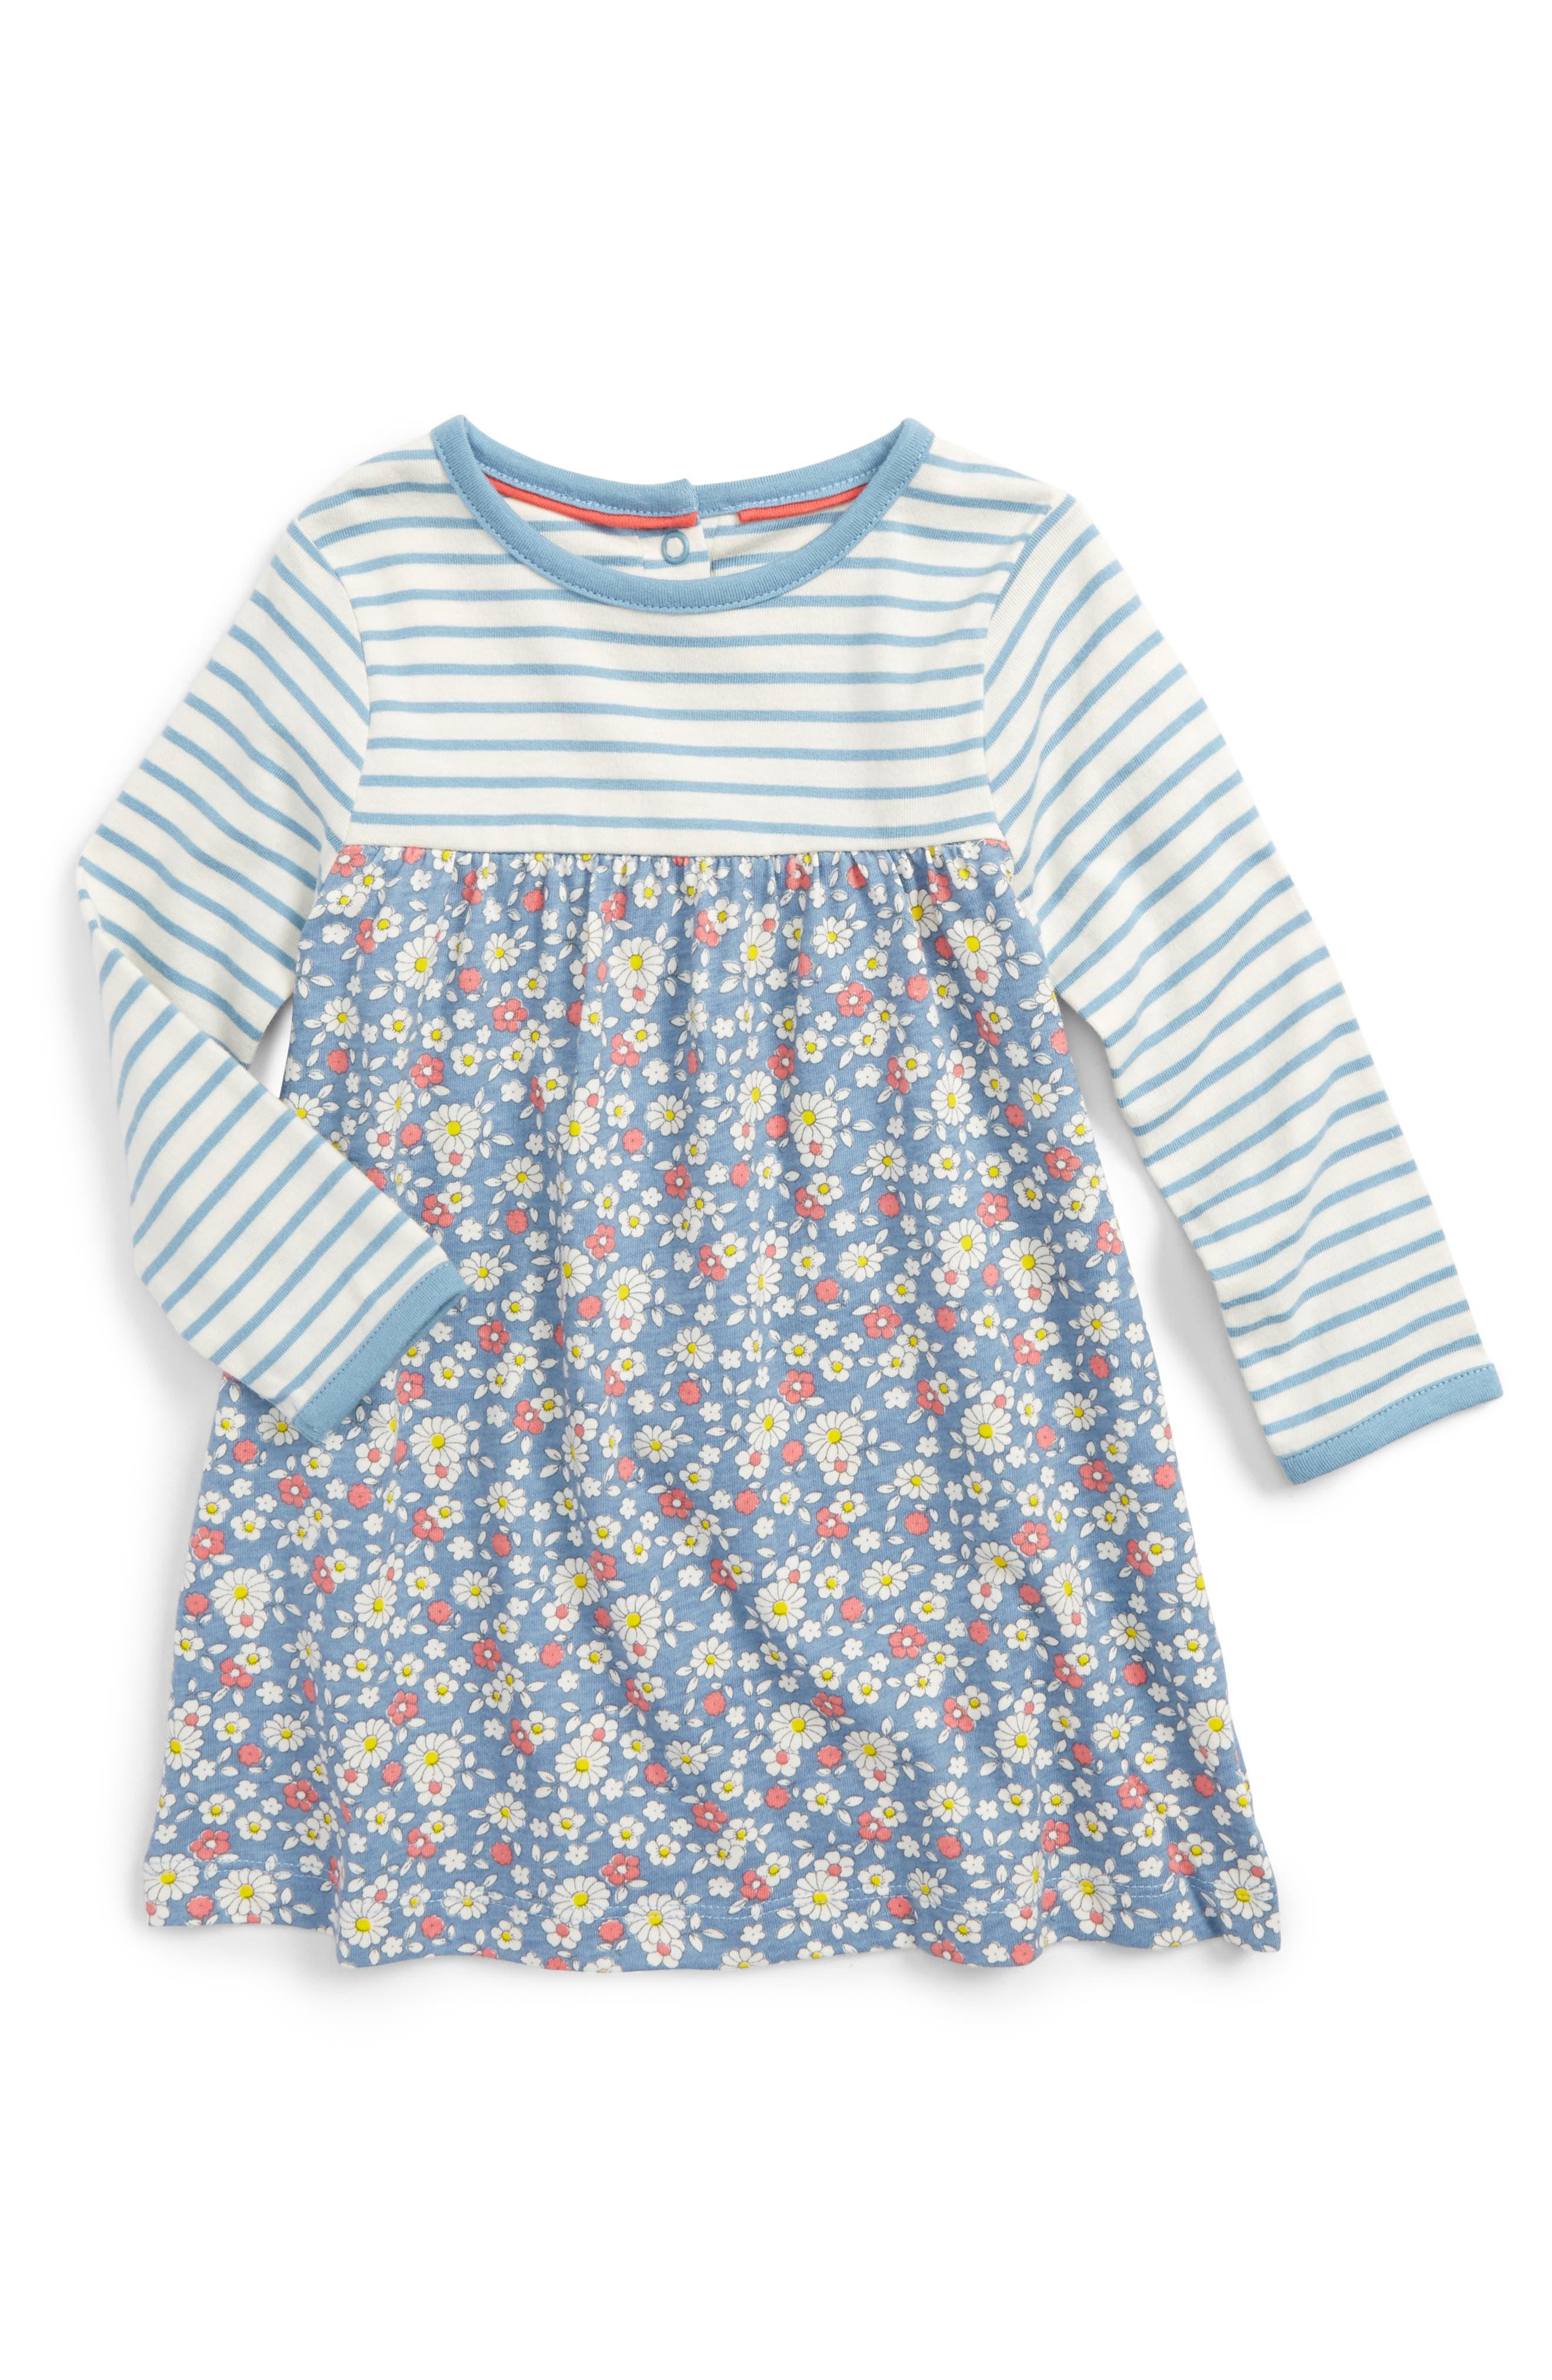 Hotchpotch Dress,                         Main,                         color, Blue Wren Vintage Daisy